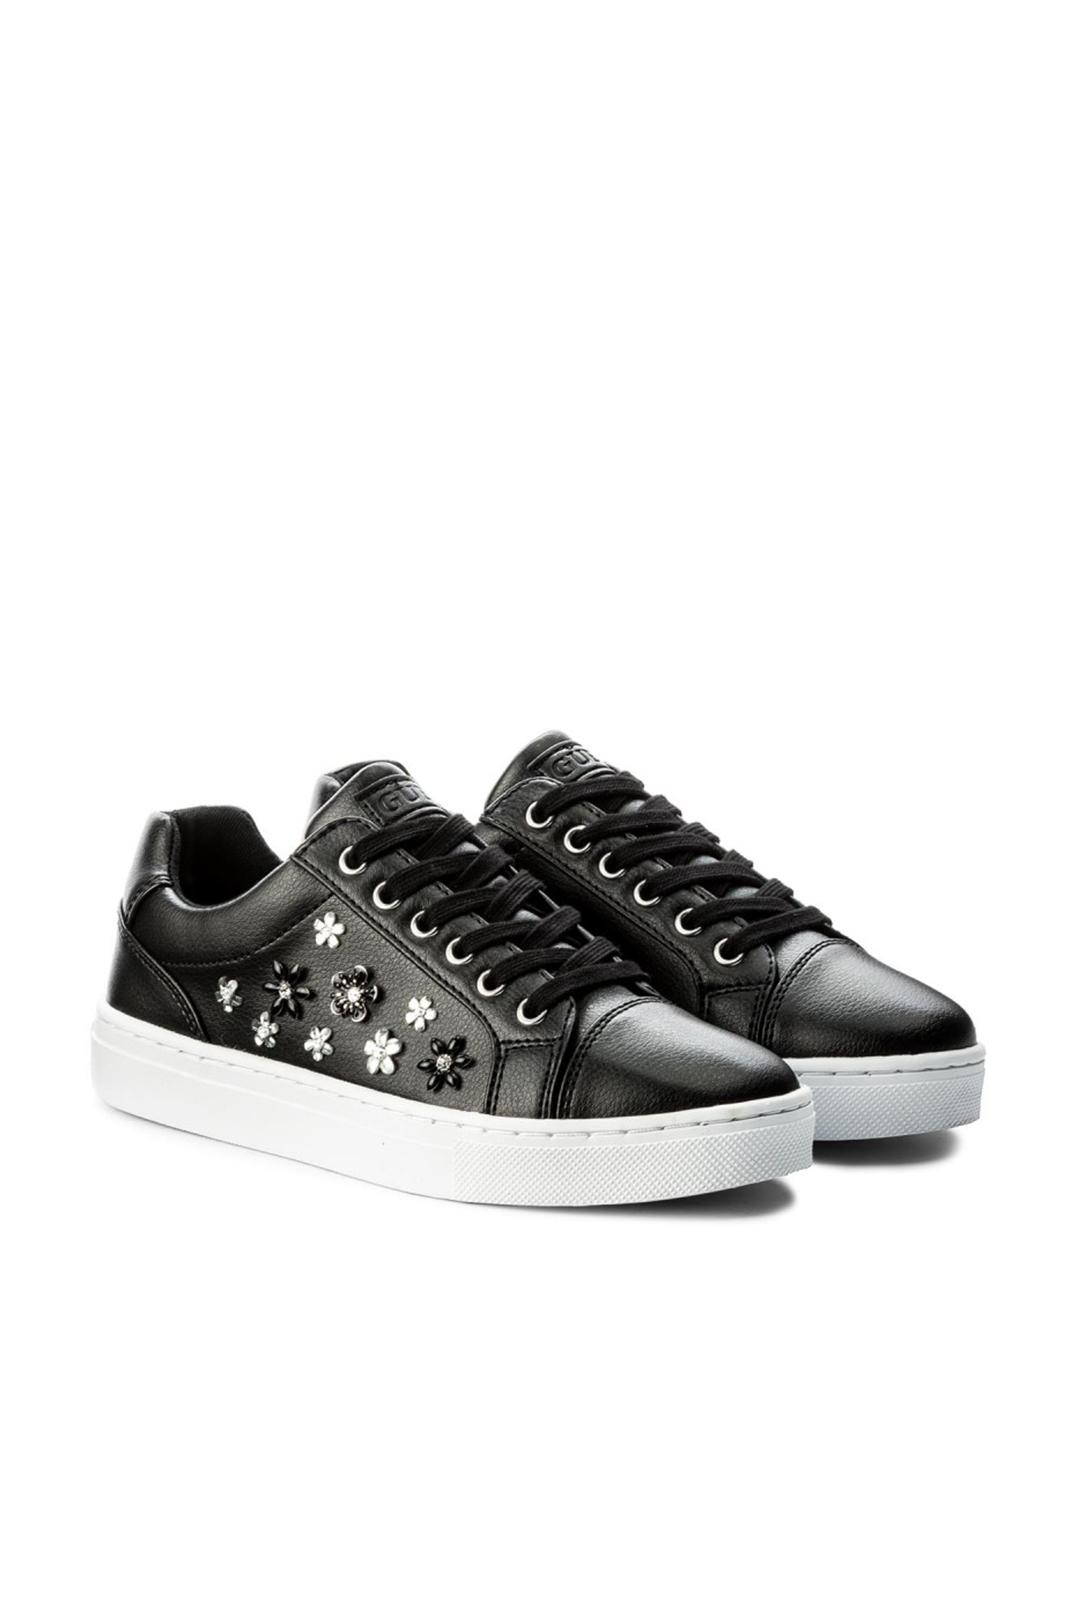 Baskets / Sneakers  Guess jeans JAMIT3 FLJMT1 ELE12 BLACK